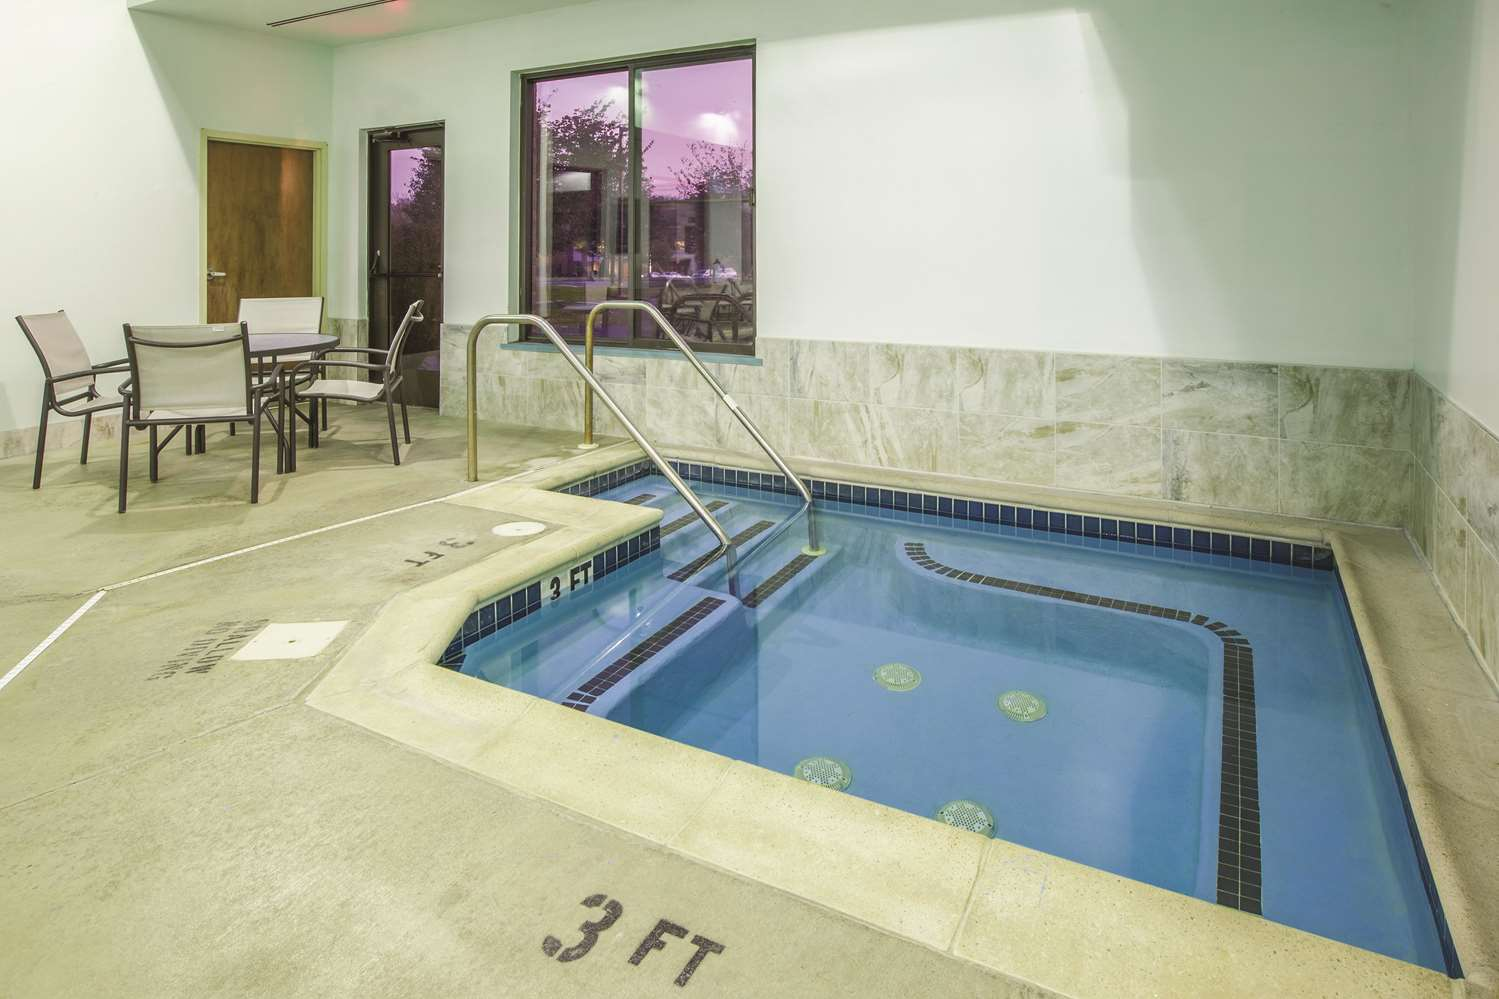 Pool - La Quinta Inn & Suites Mechanicsburg